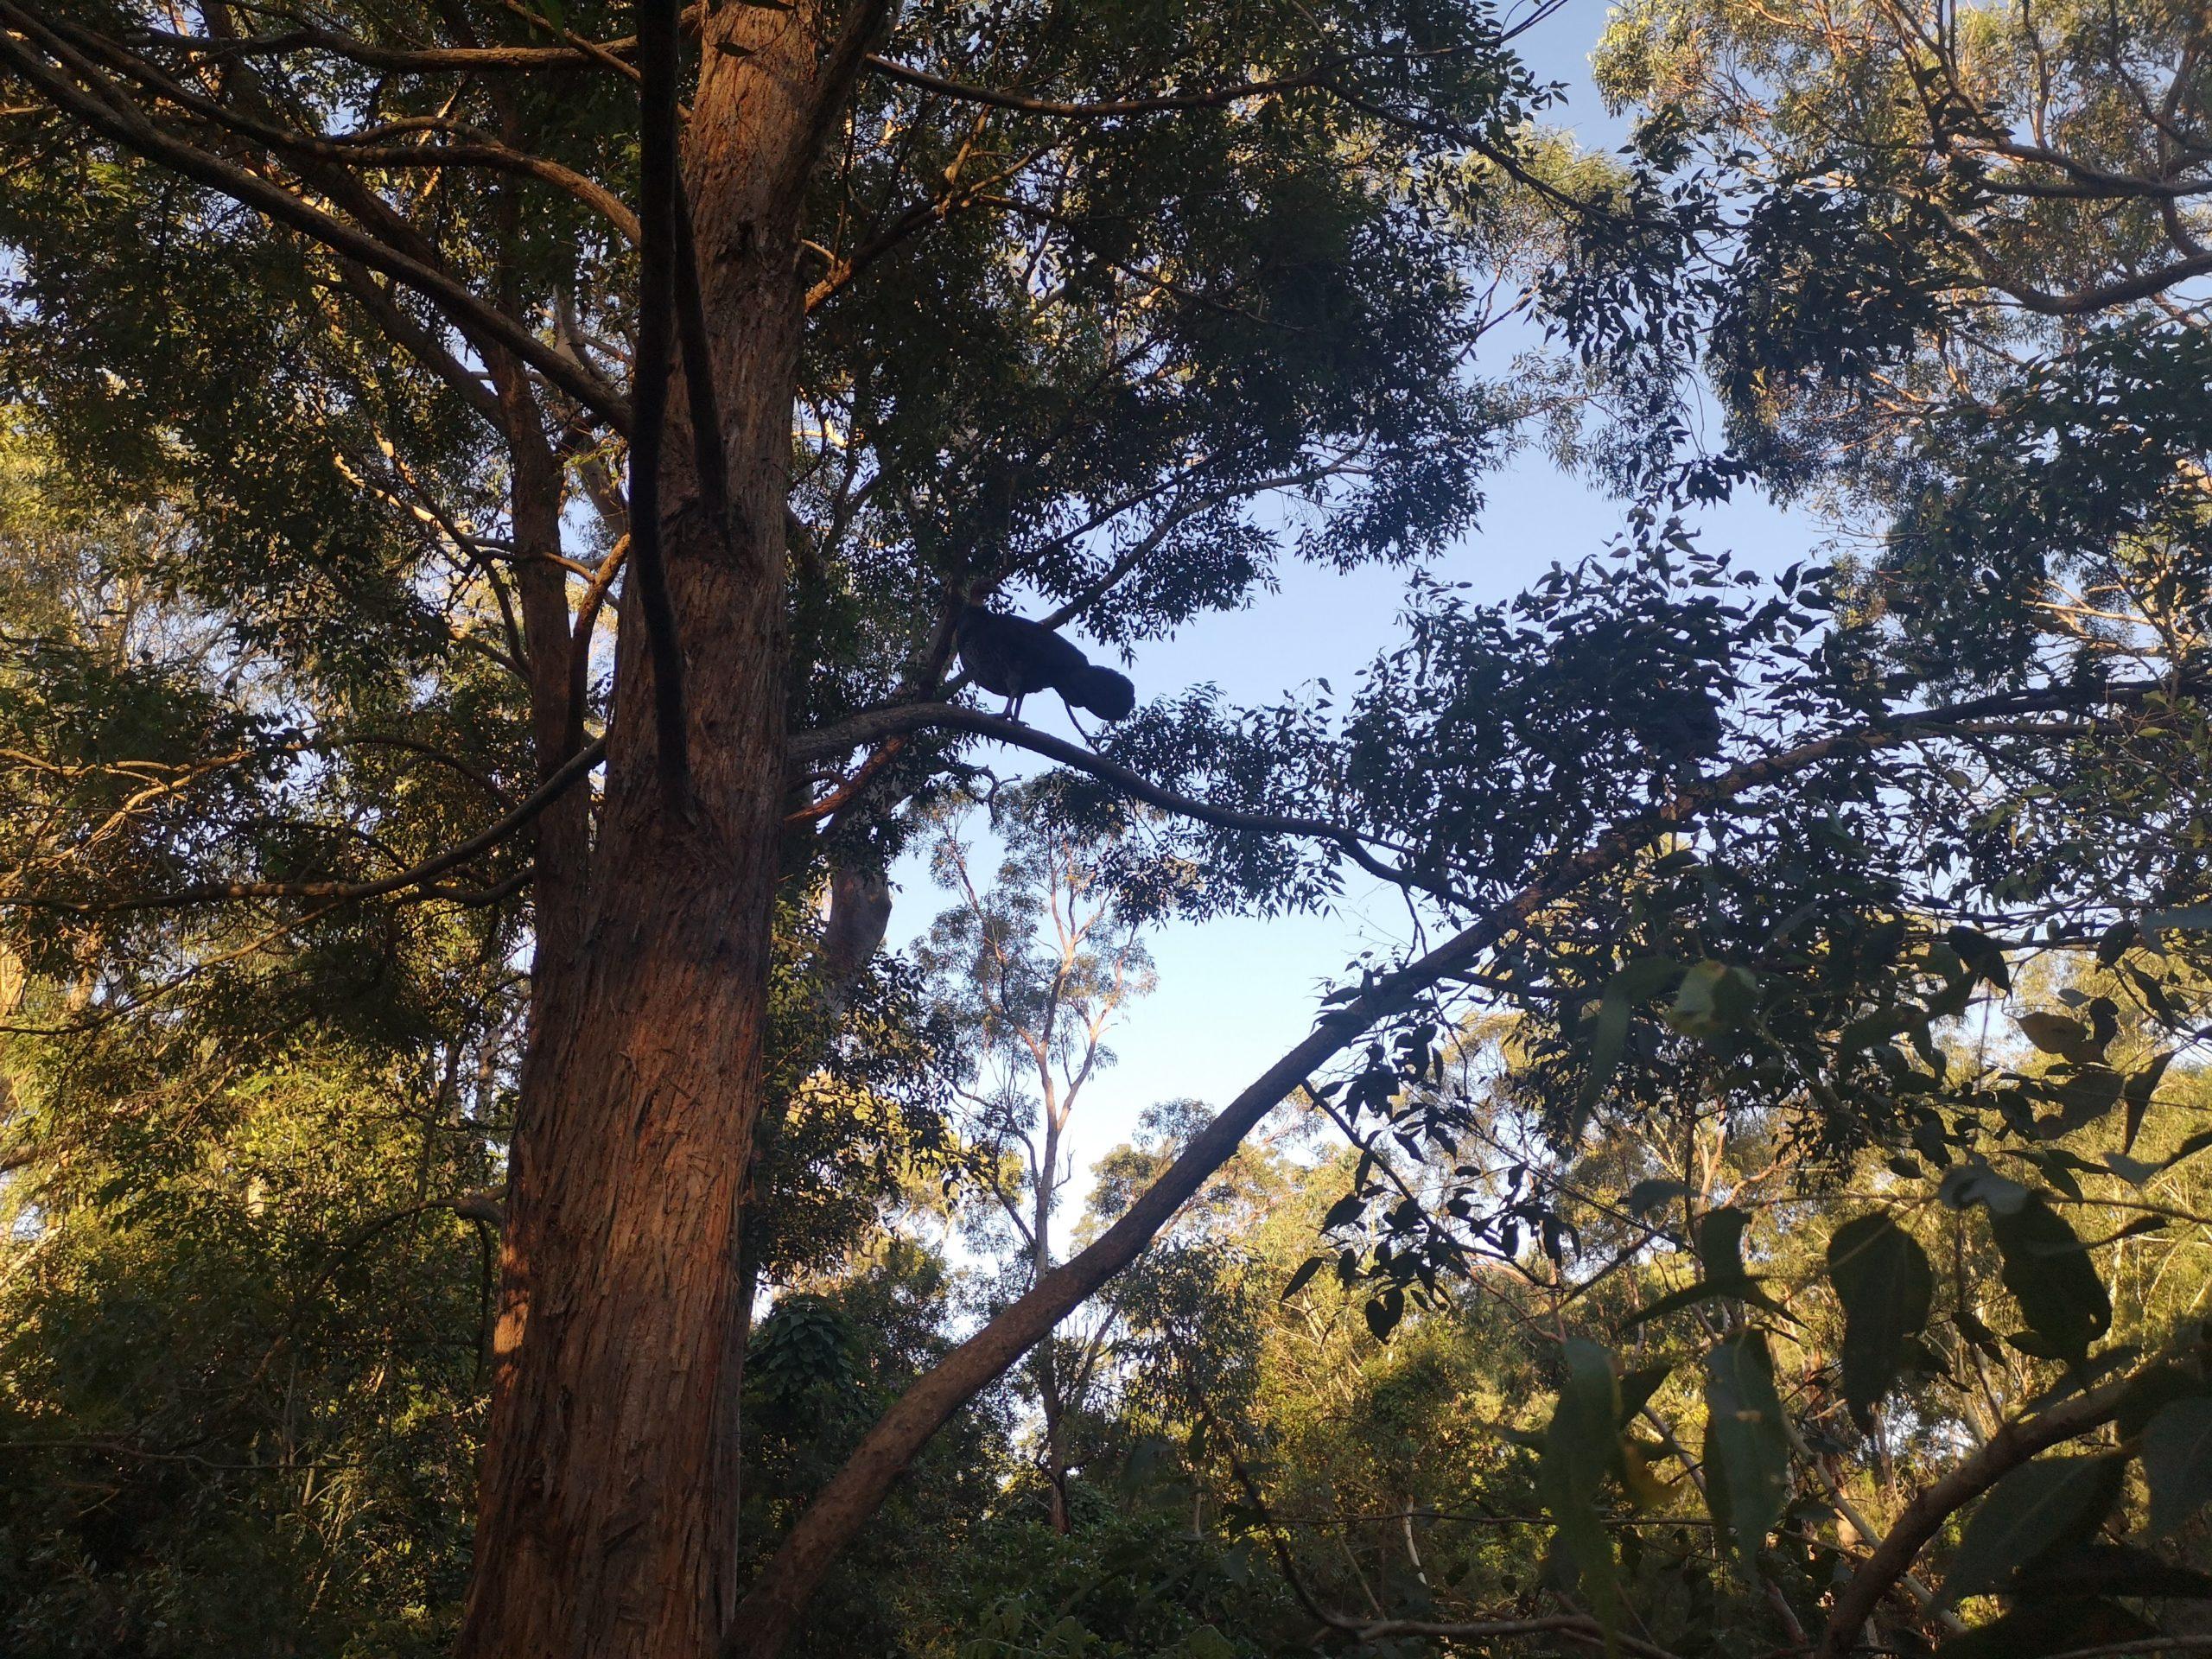 Native bush turkeys roosting on an urban tree